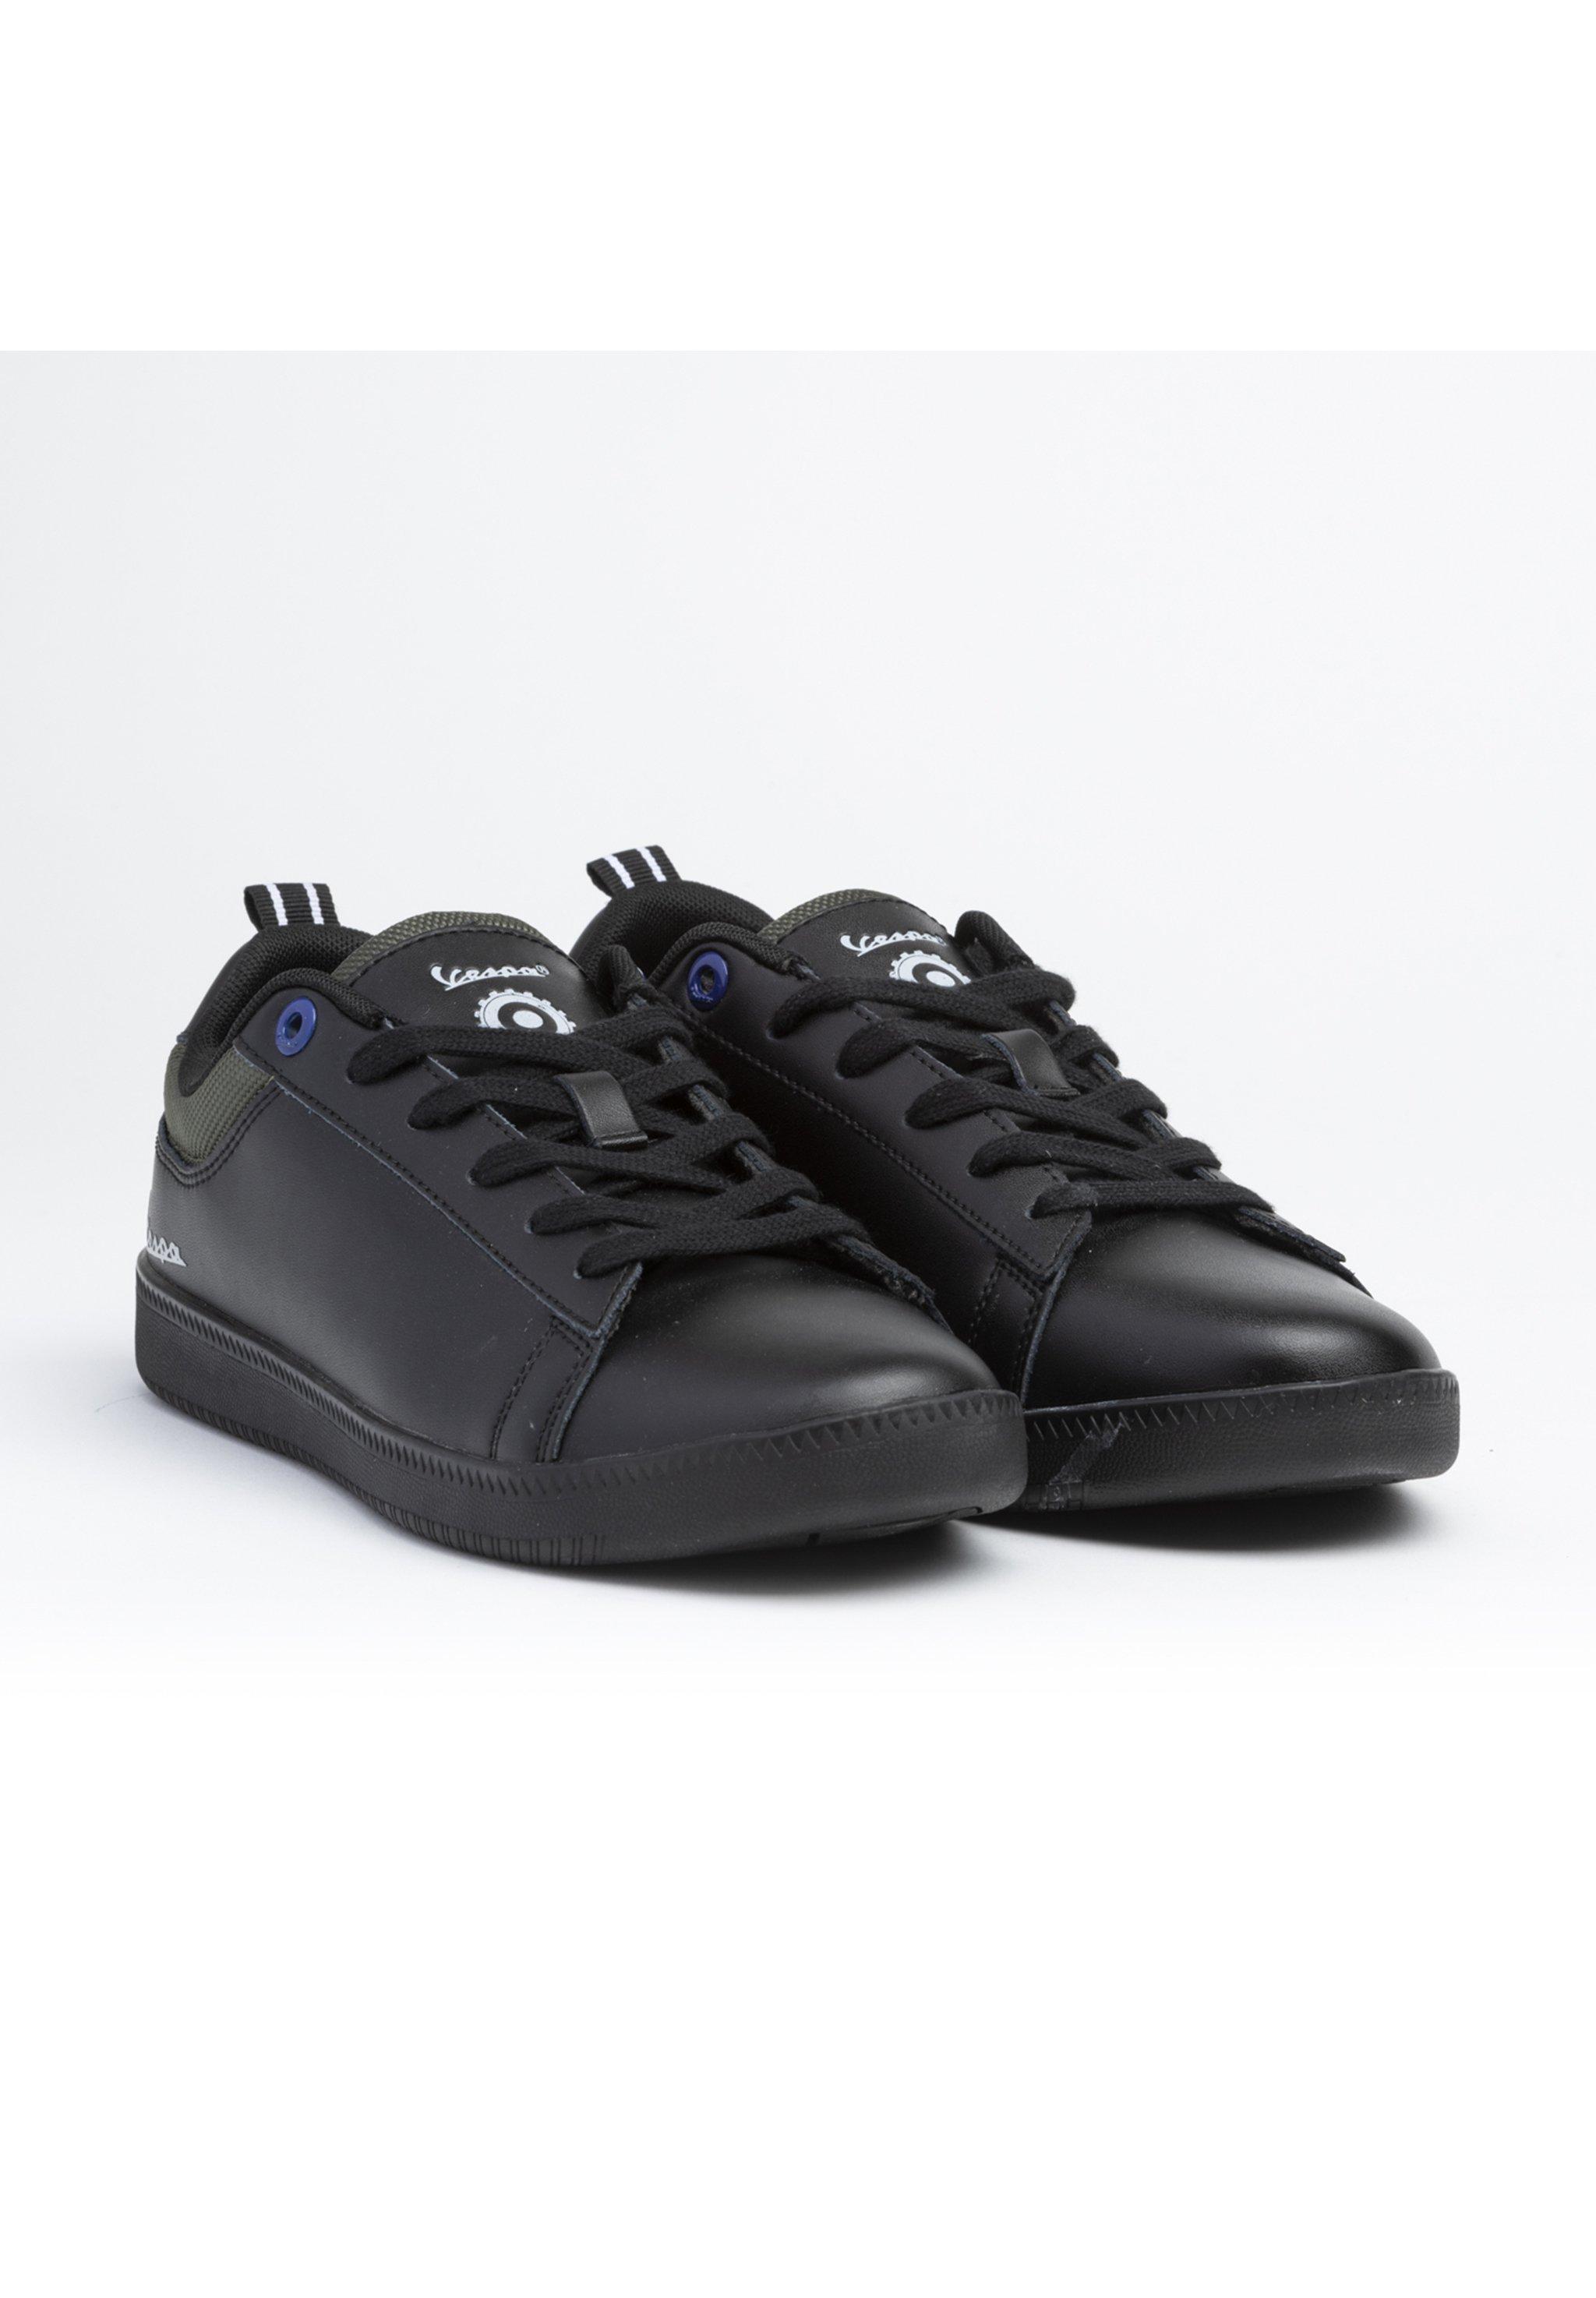 Vespa Festival - Sneakers Basse 99 Nero KnpNU